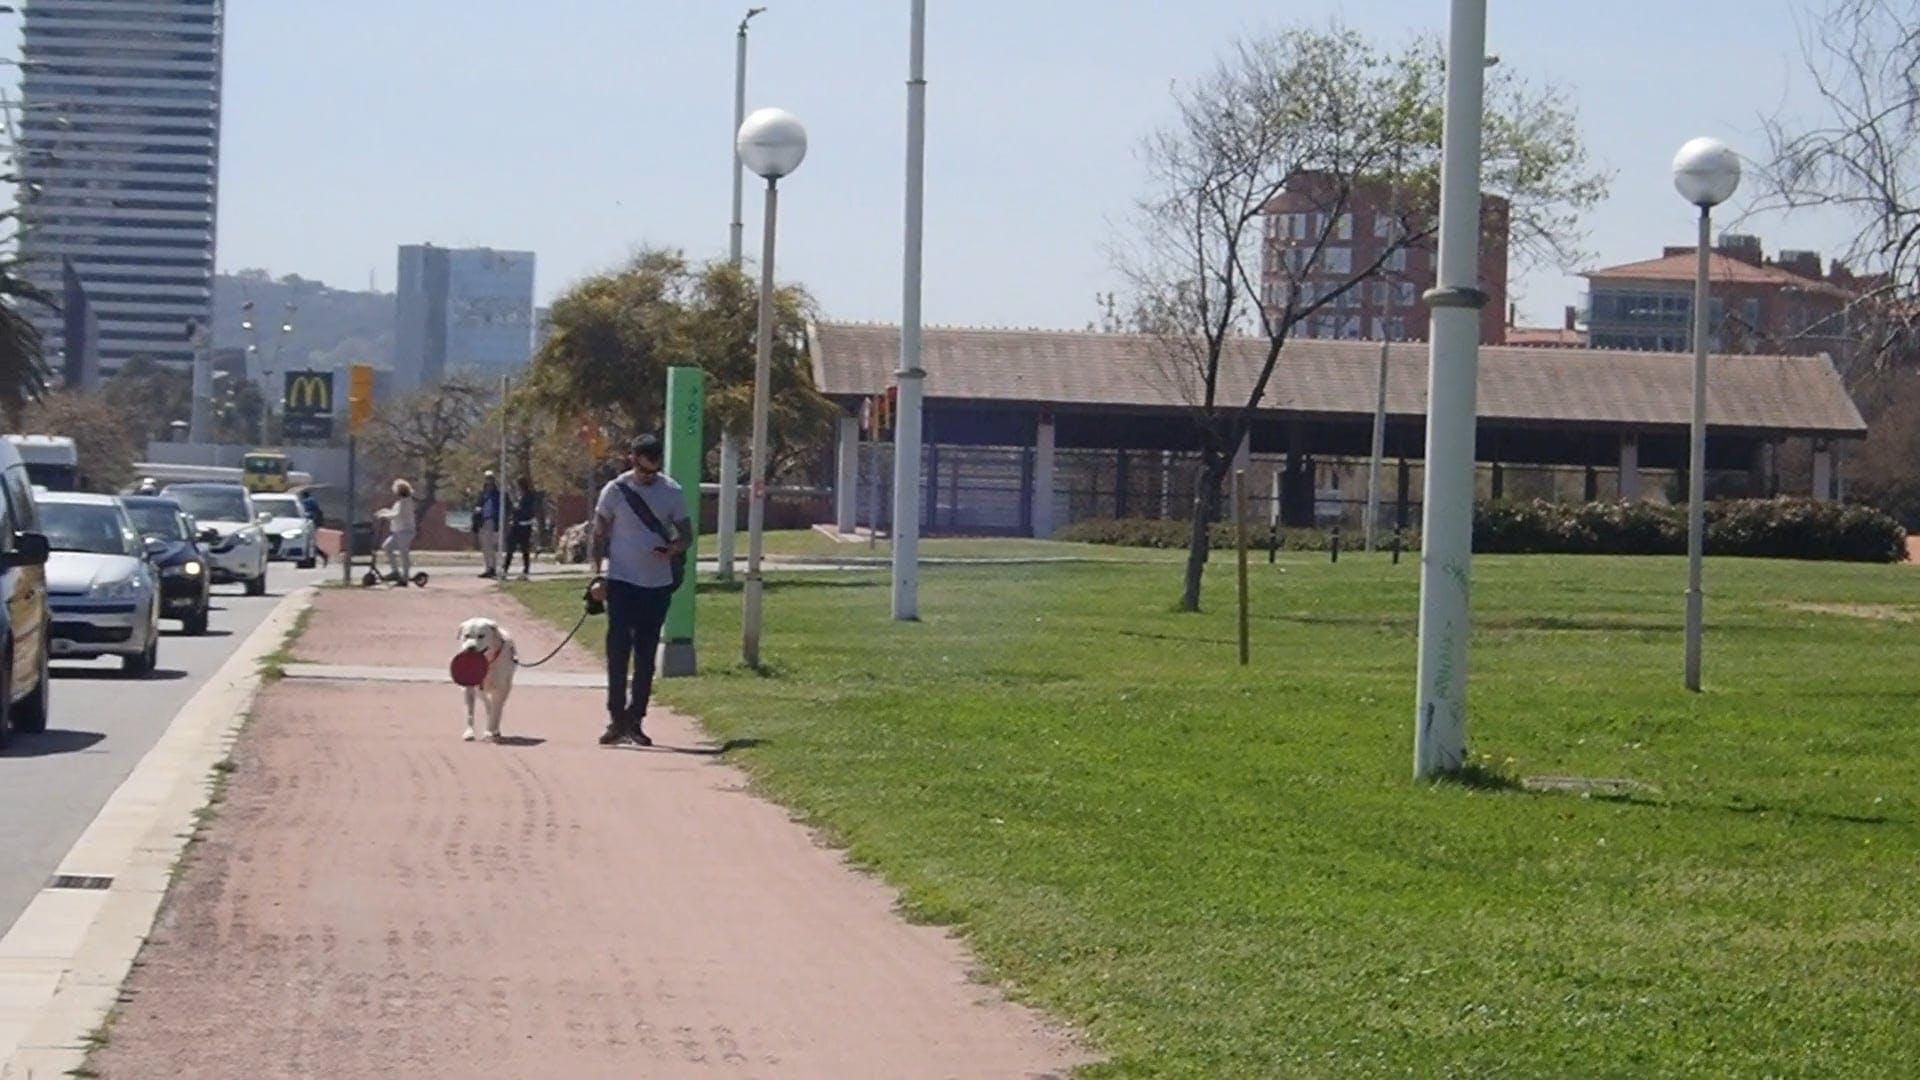 Man Walking The Dog At The Street